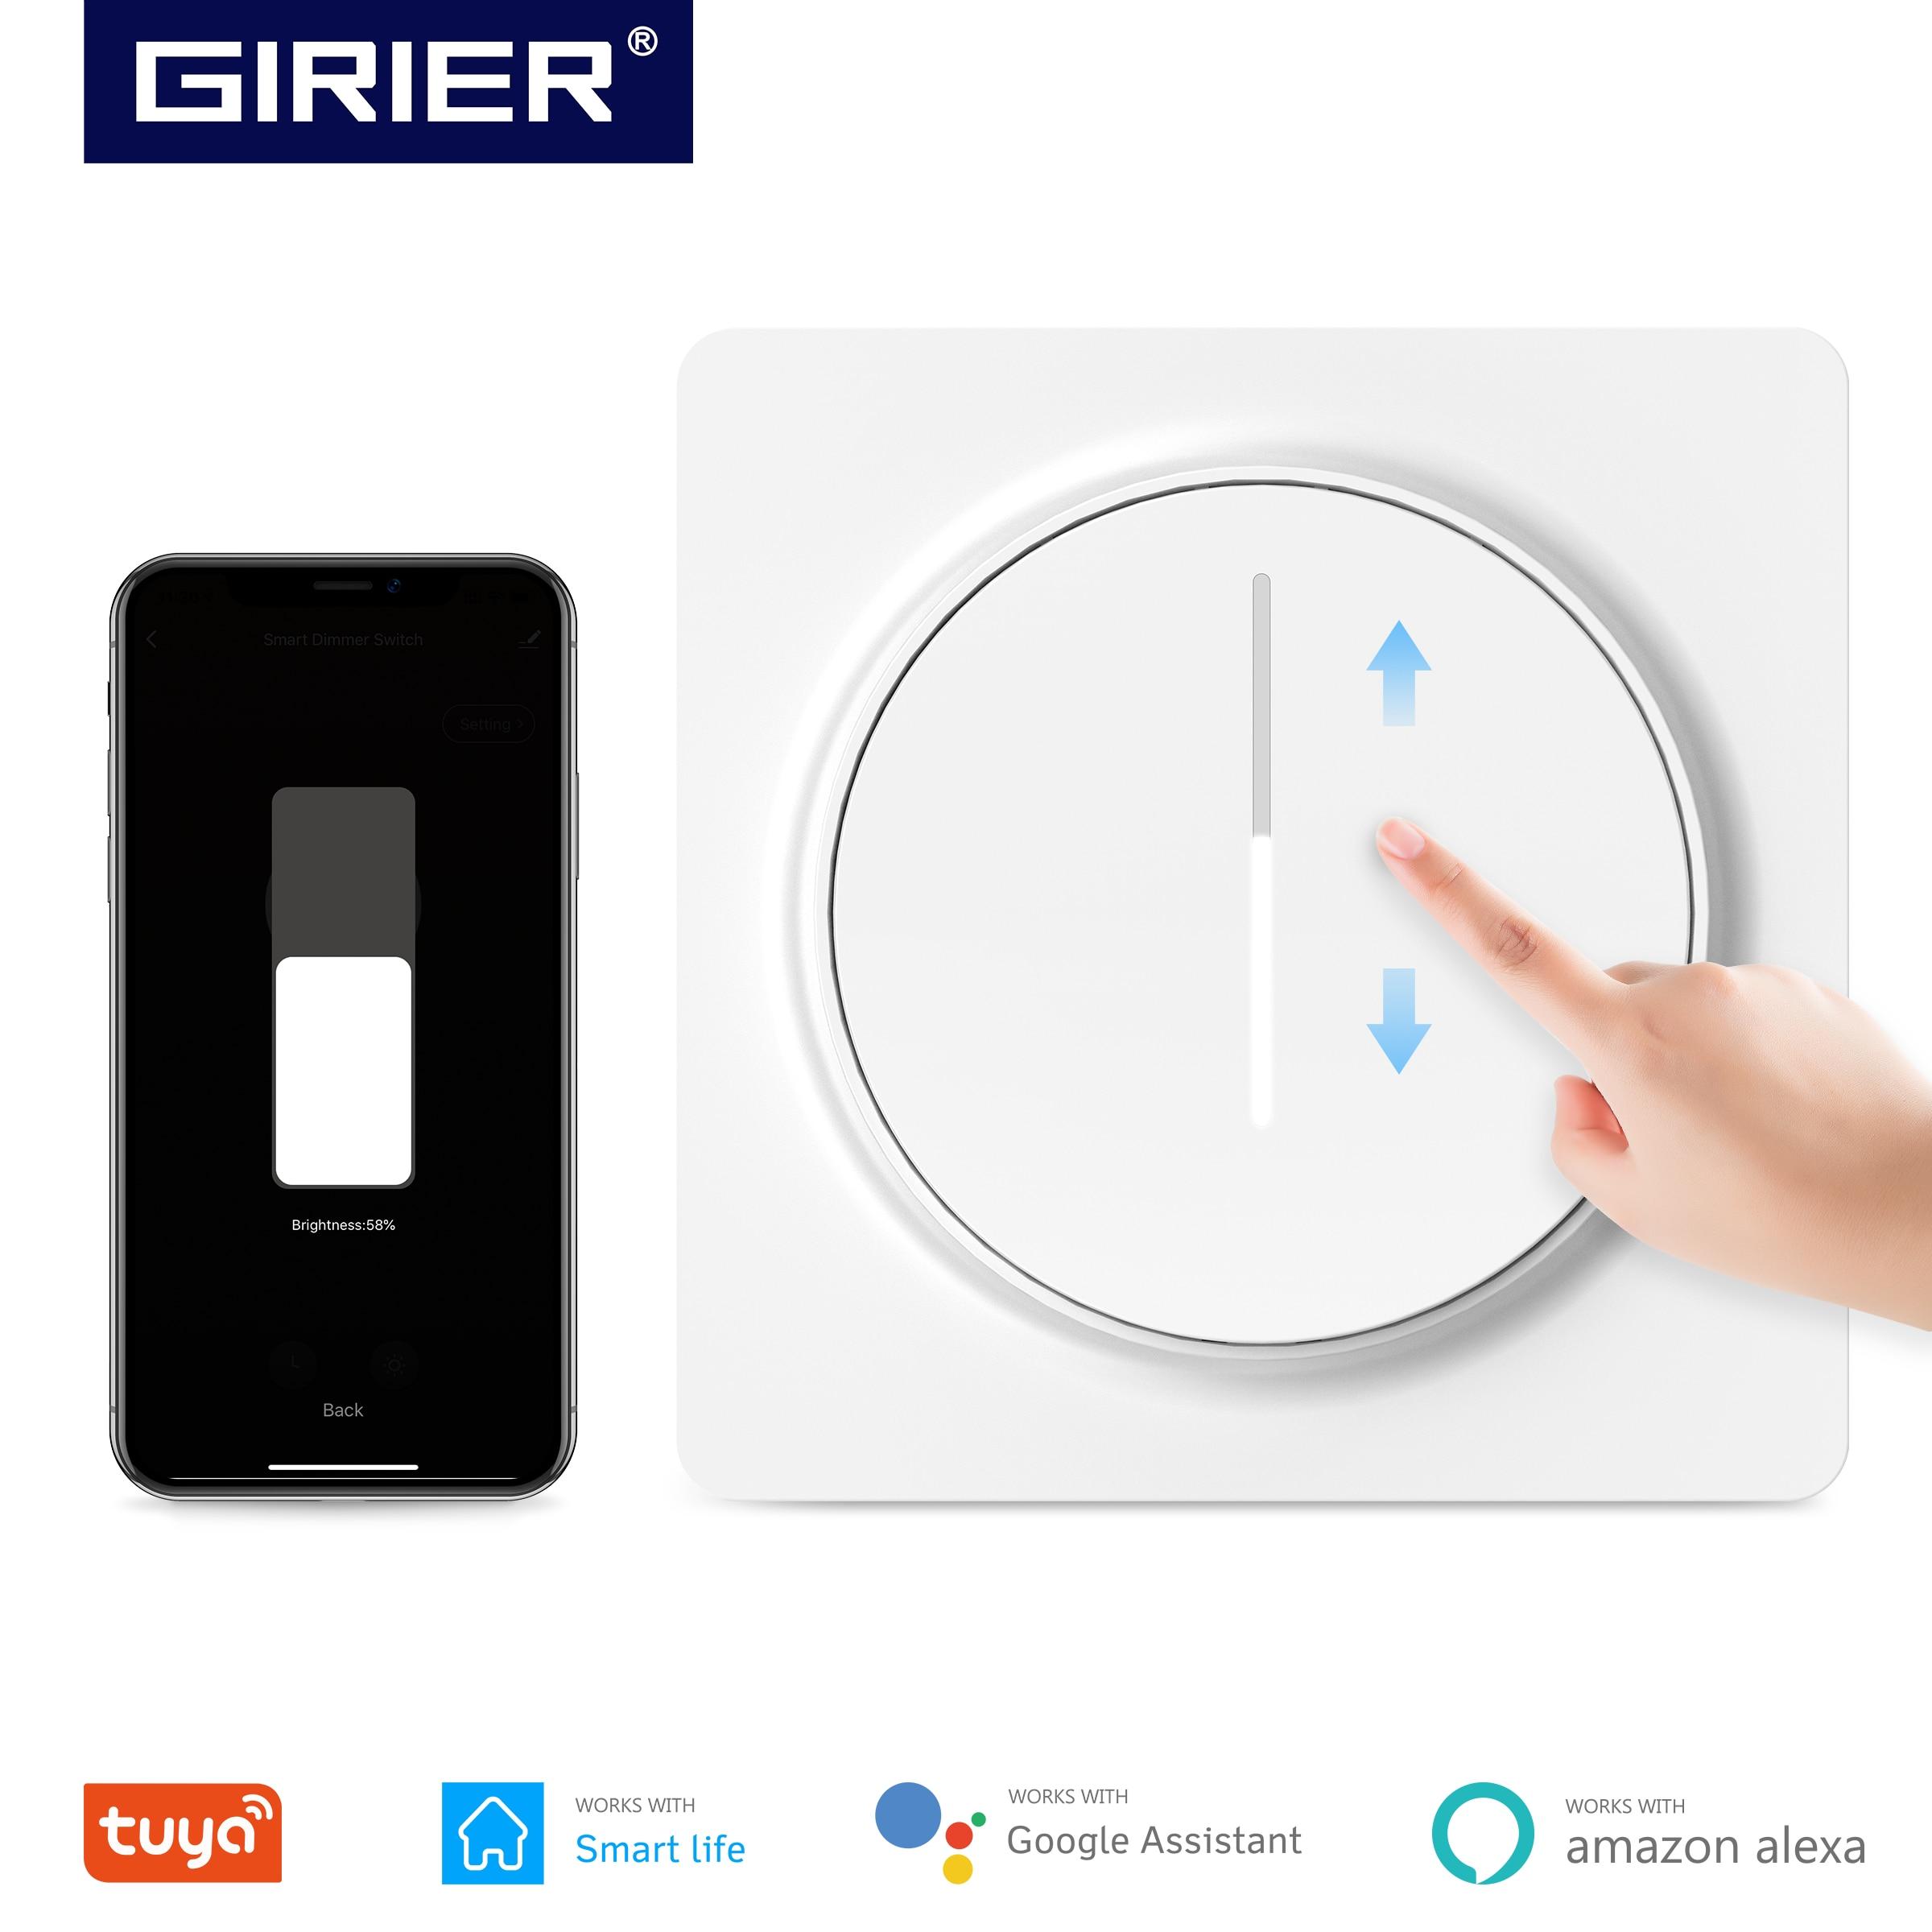 Tuya-مفتاح حائط ذكي مع لوحة تعتيم Wifi ، 100-240 فولت ، الاتحاد الأوروبي ، يعمل مع Alexa Google Home ، لا يوجد محور مطلوب